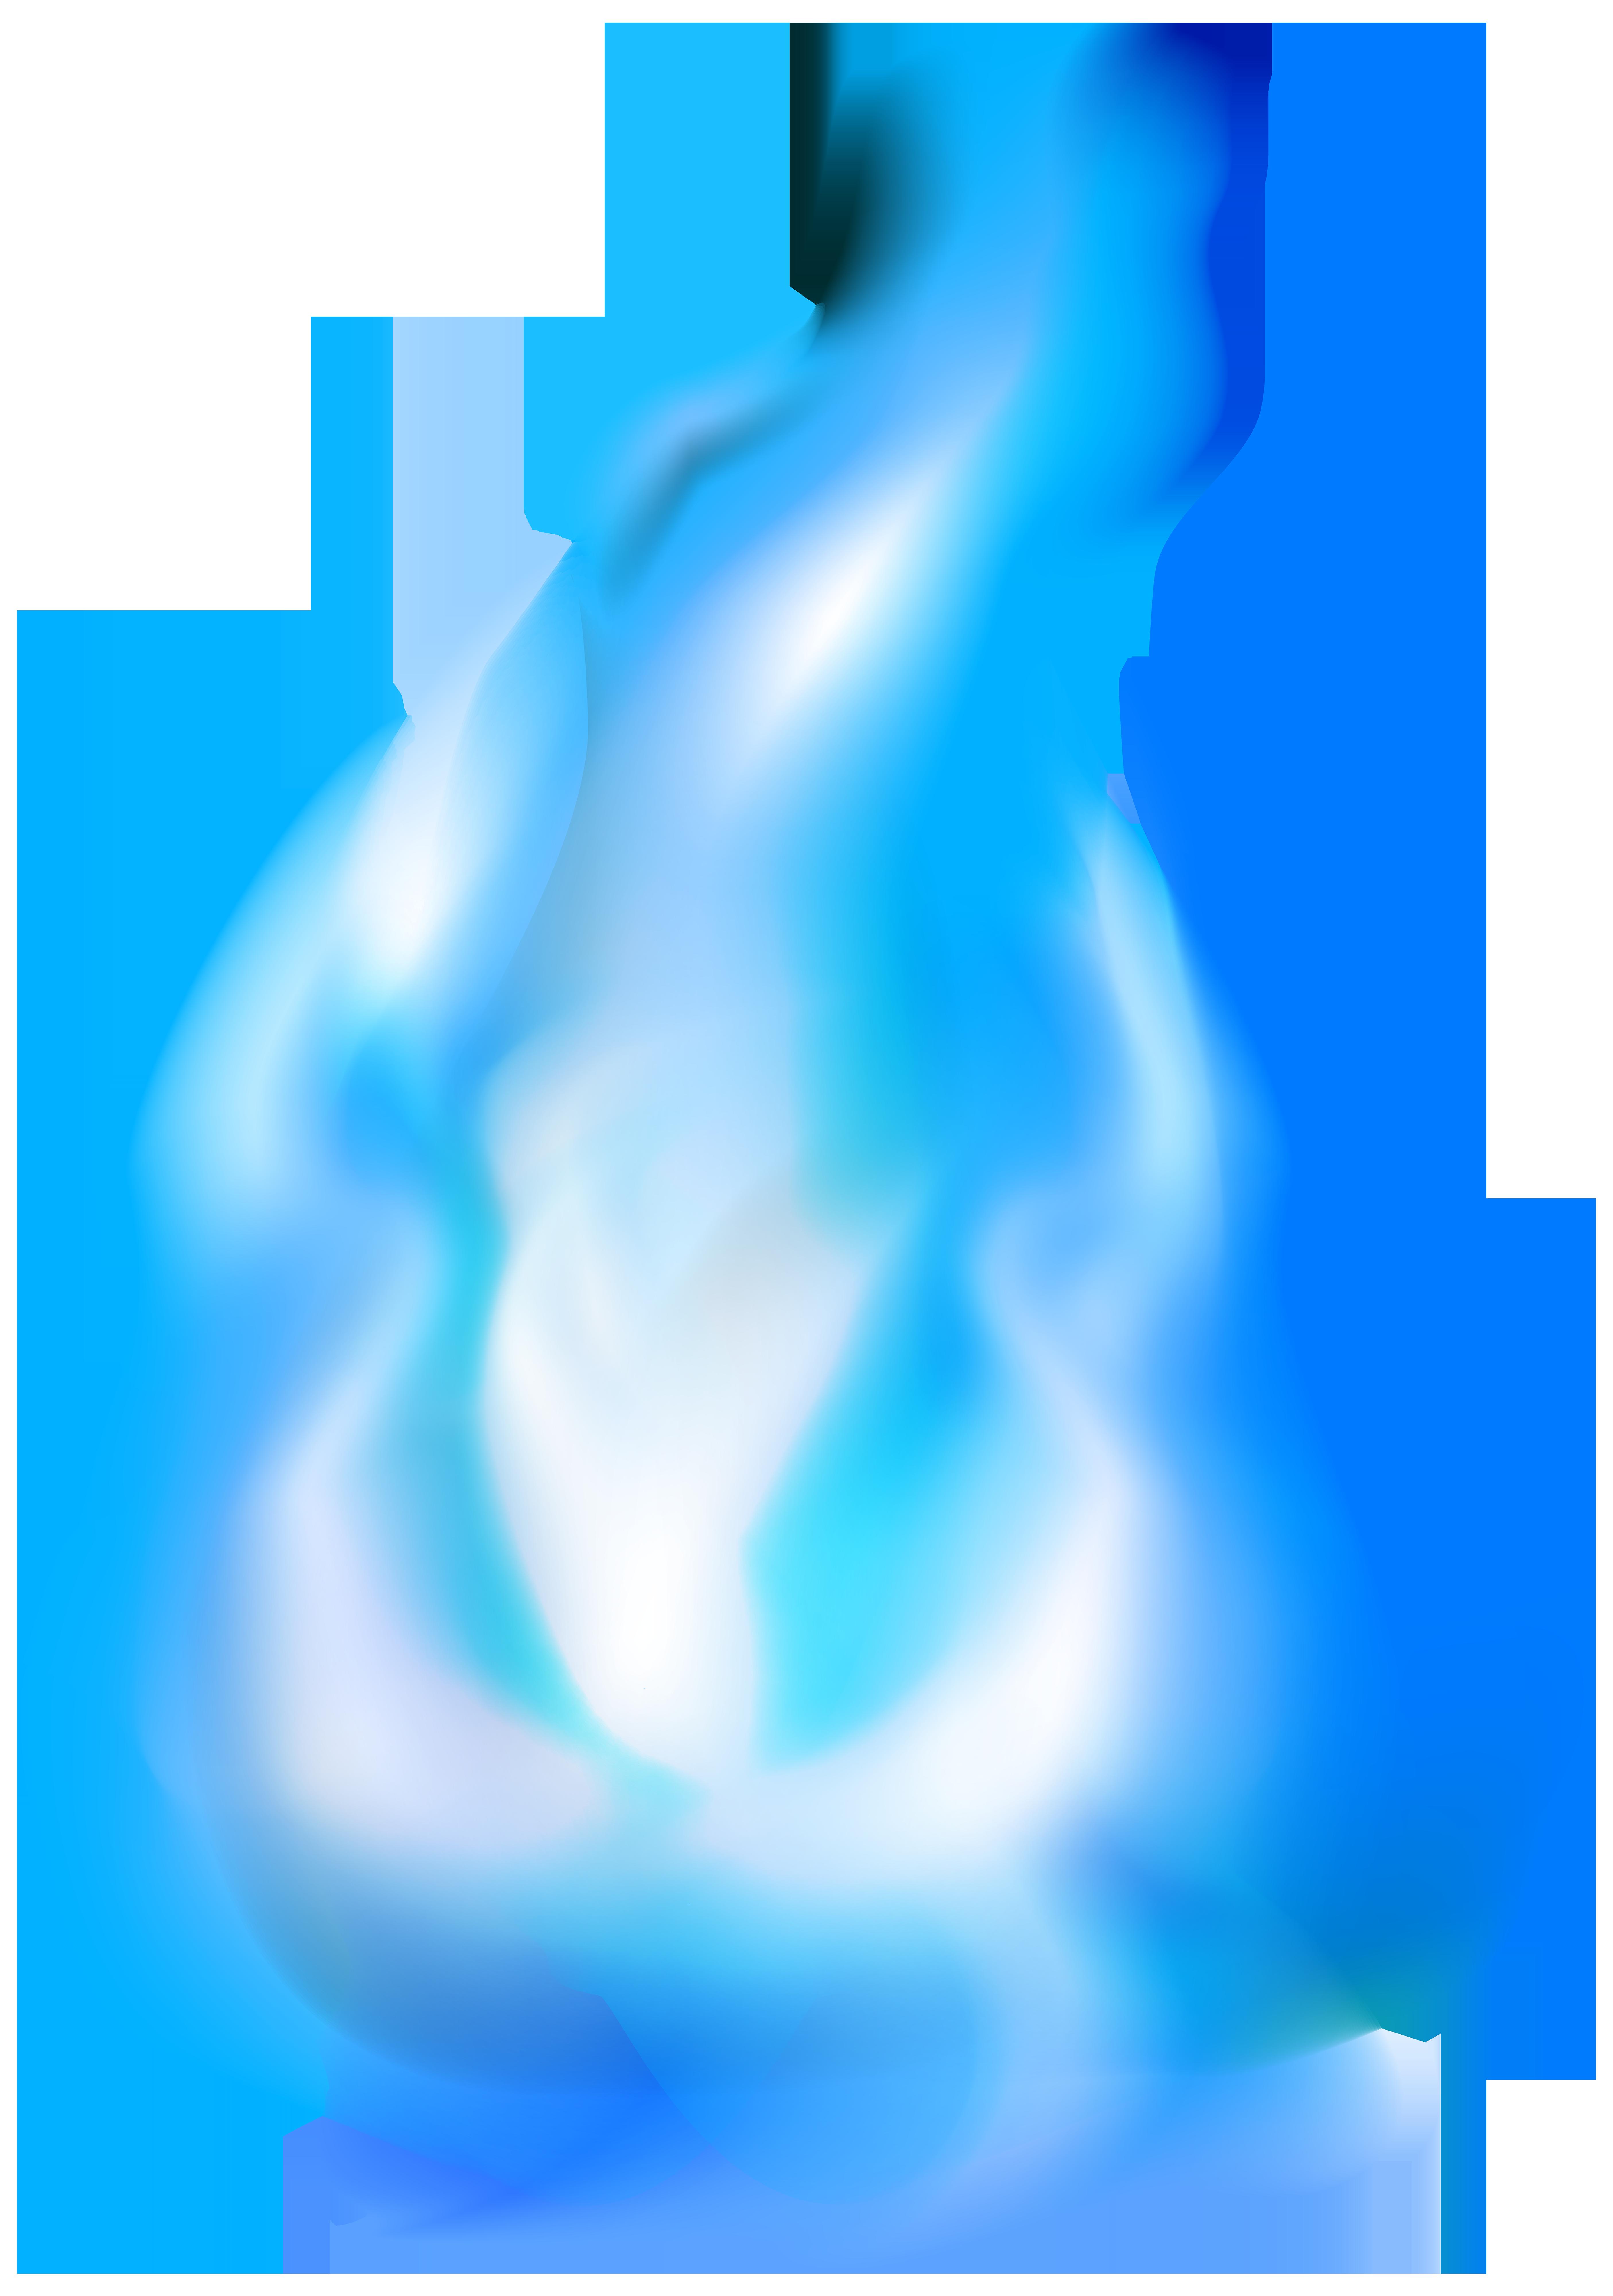 Blue Flame PNG Clip Art Image.